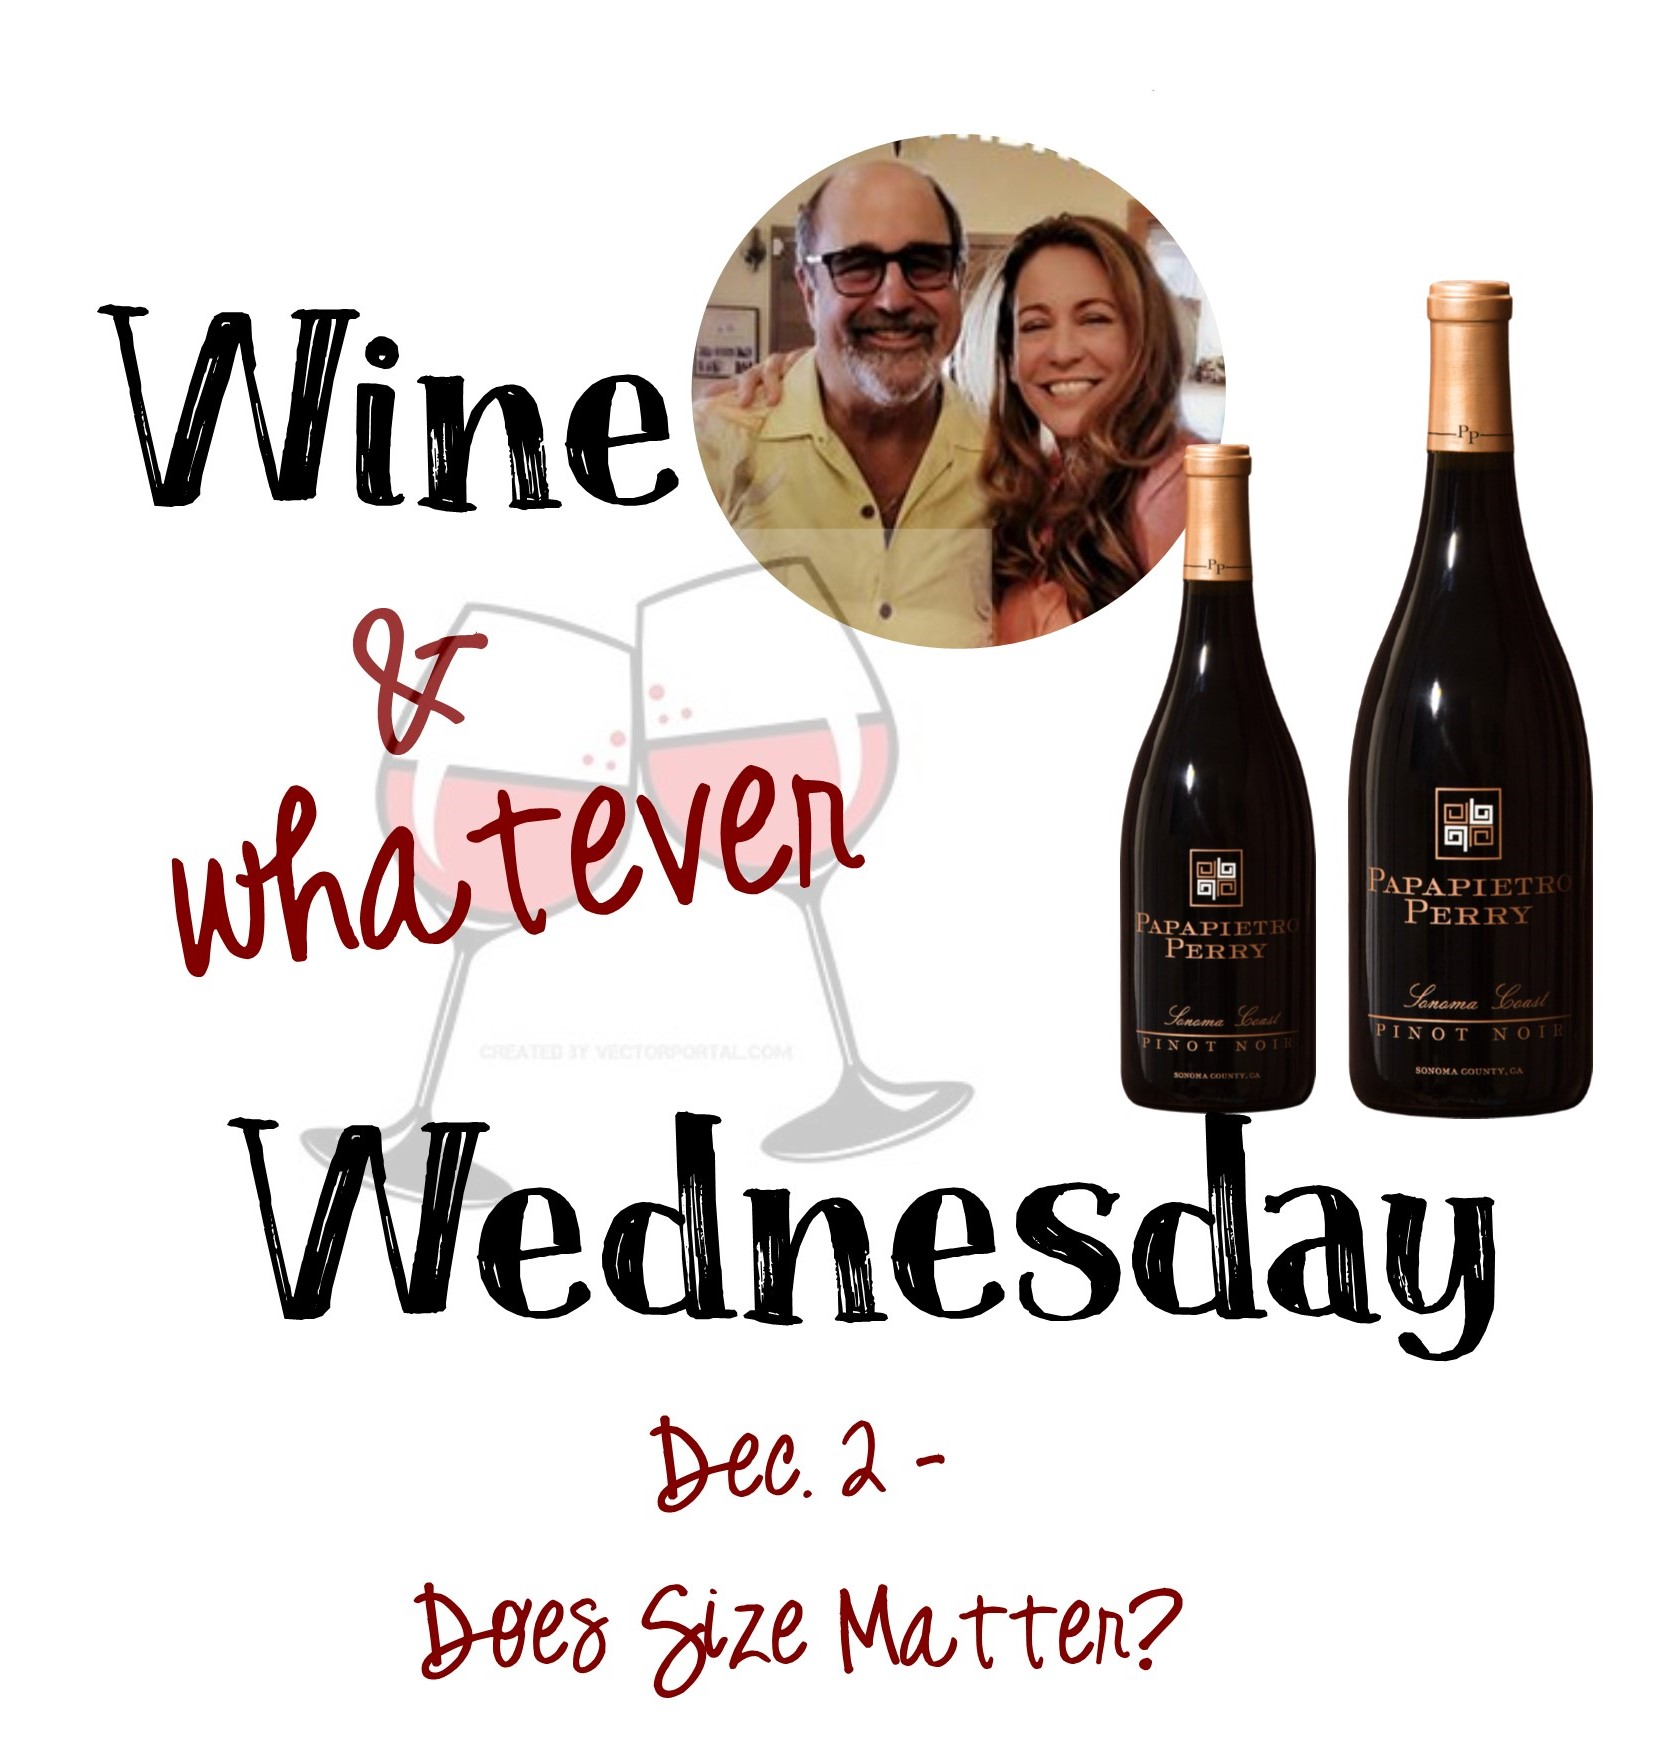 Dec. 2 Wine Whatever Wednesday Ben Kristen large bottles